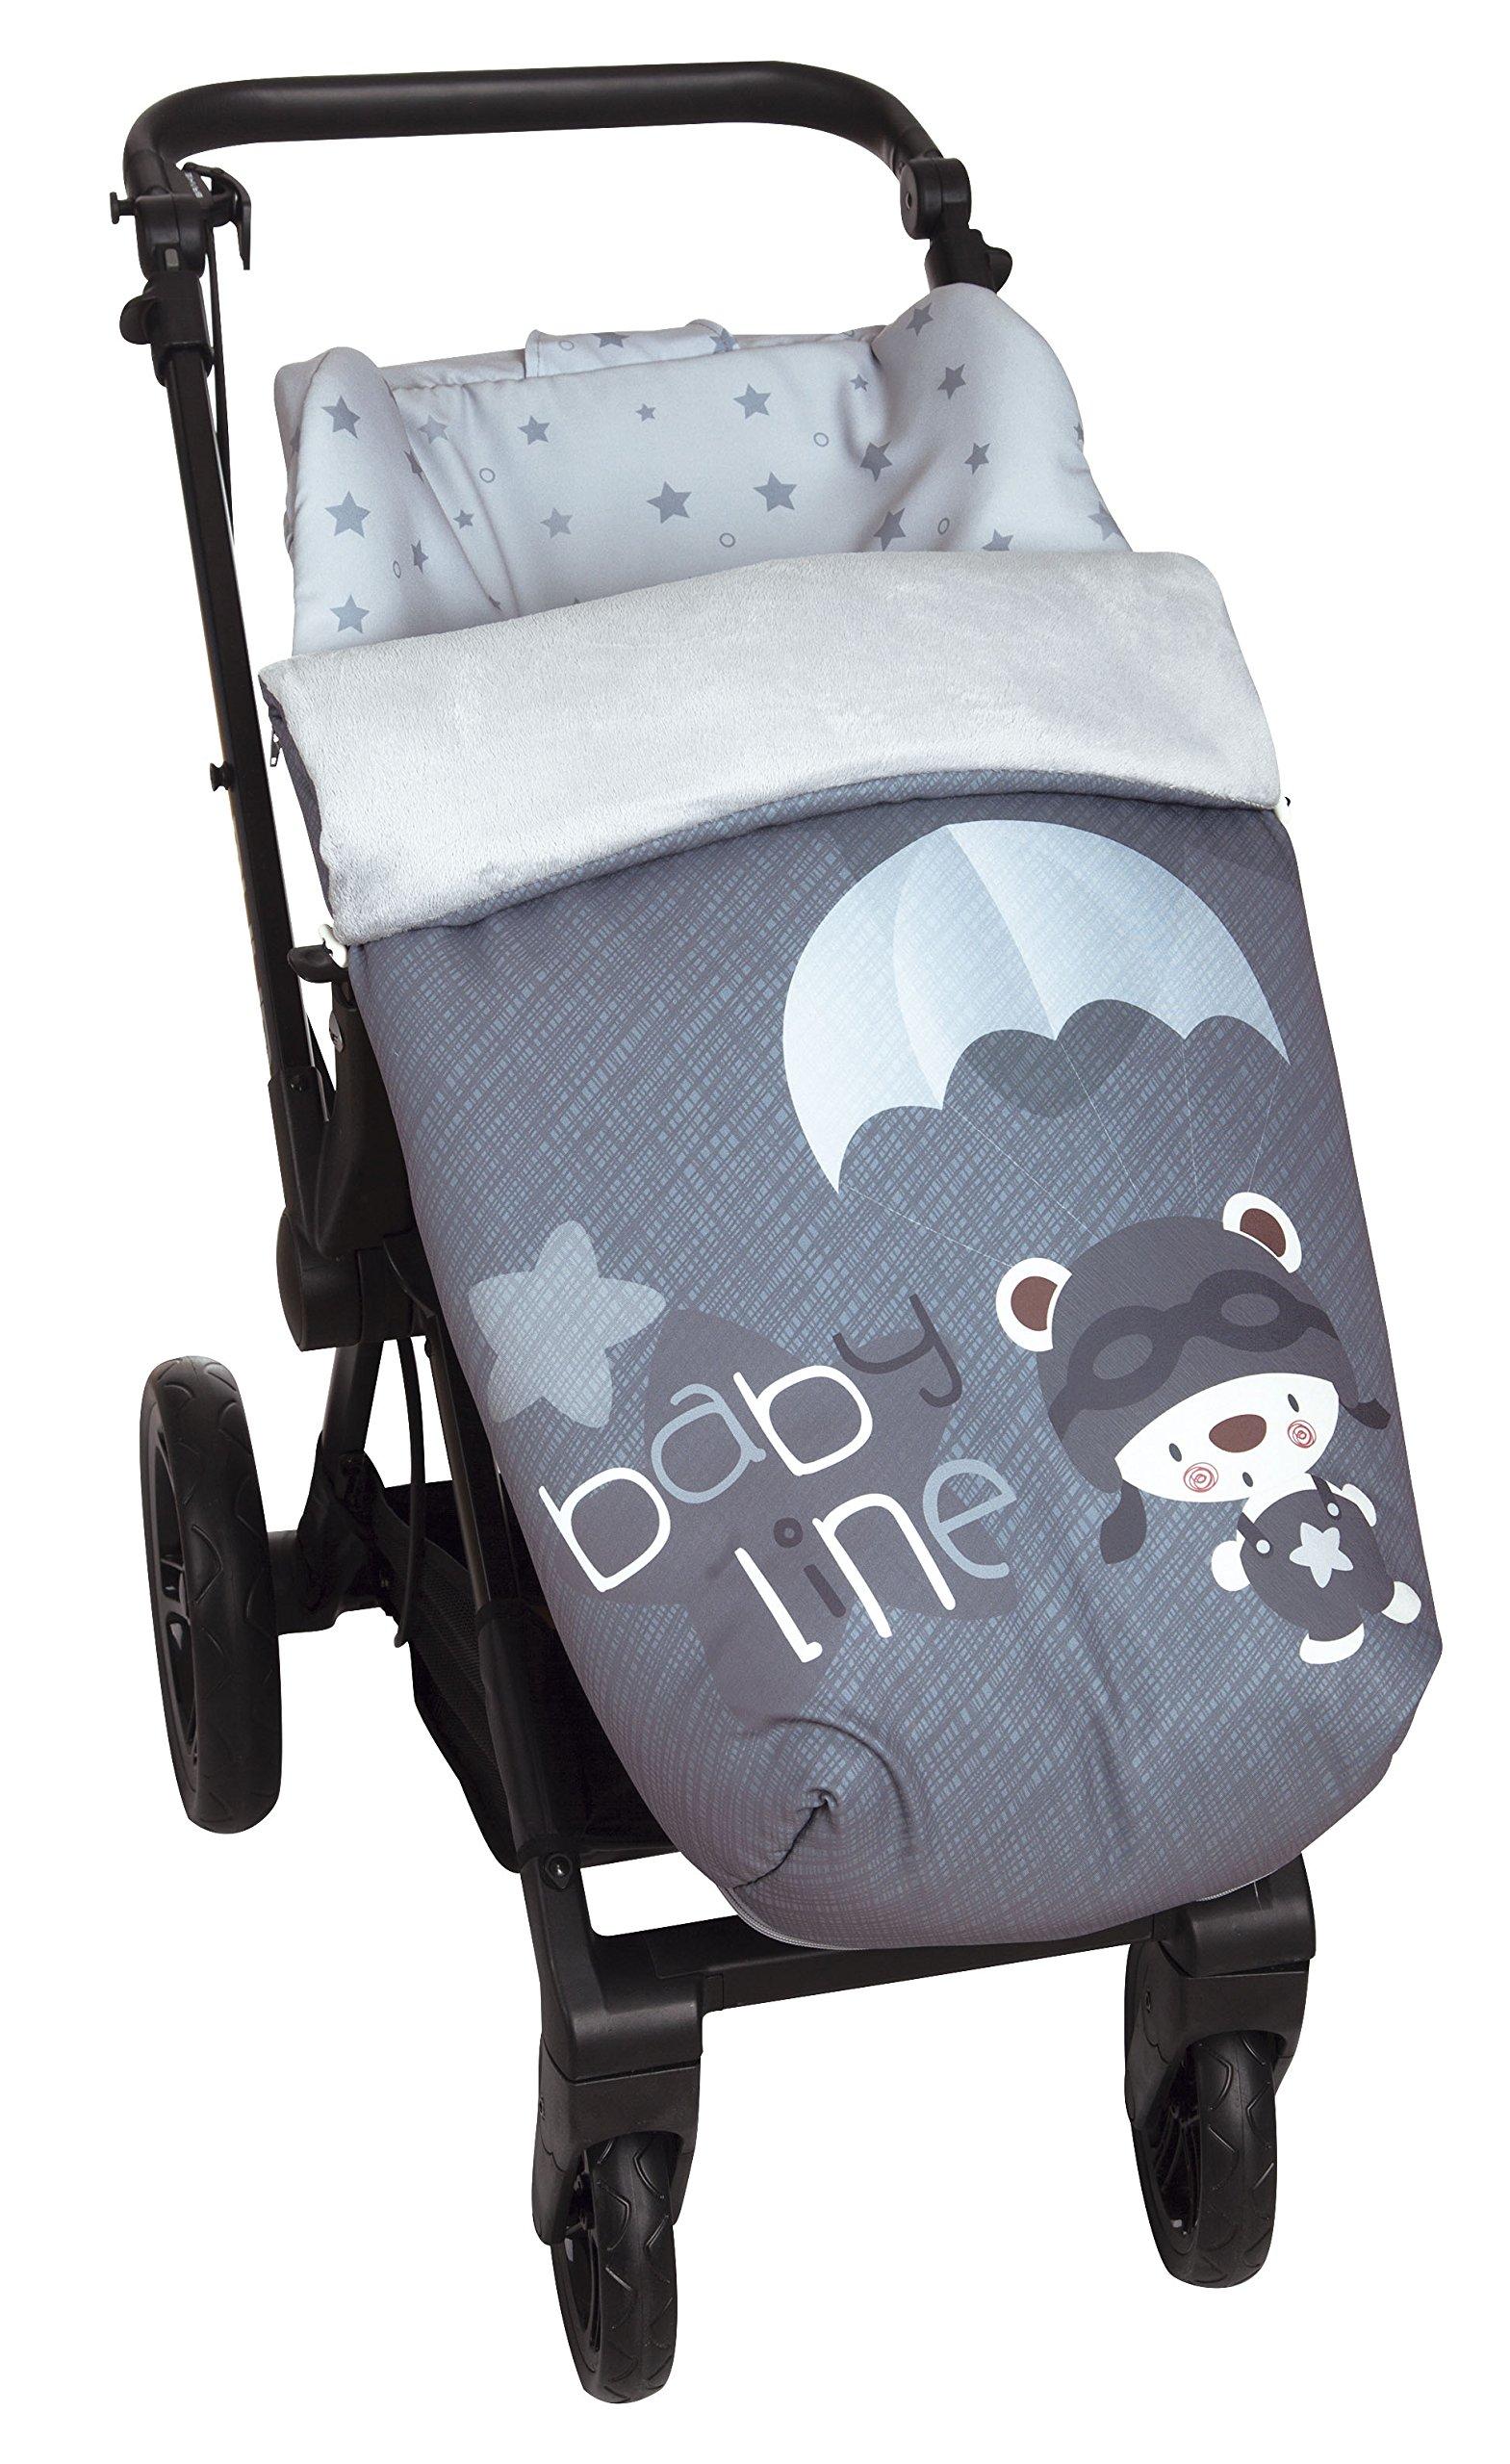 Saco de Bebé Universal Silla con Cubre Pies Polar, Desmontable con Cremalleras. Lavable a